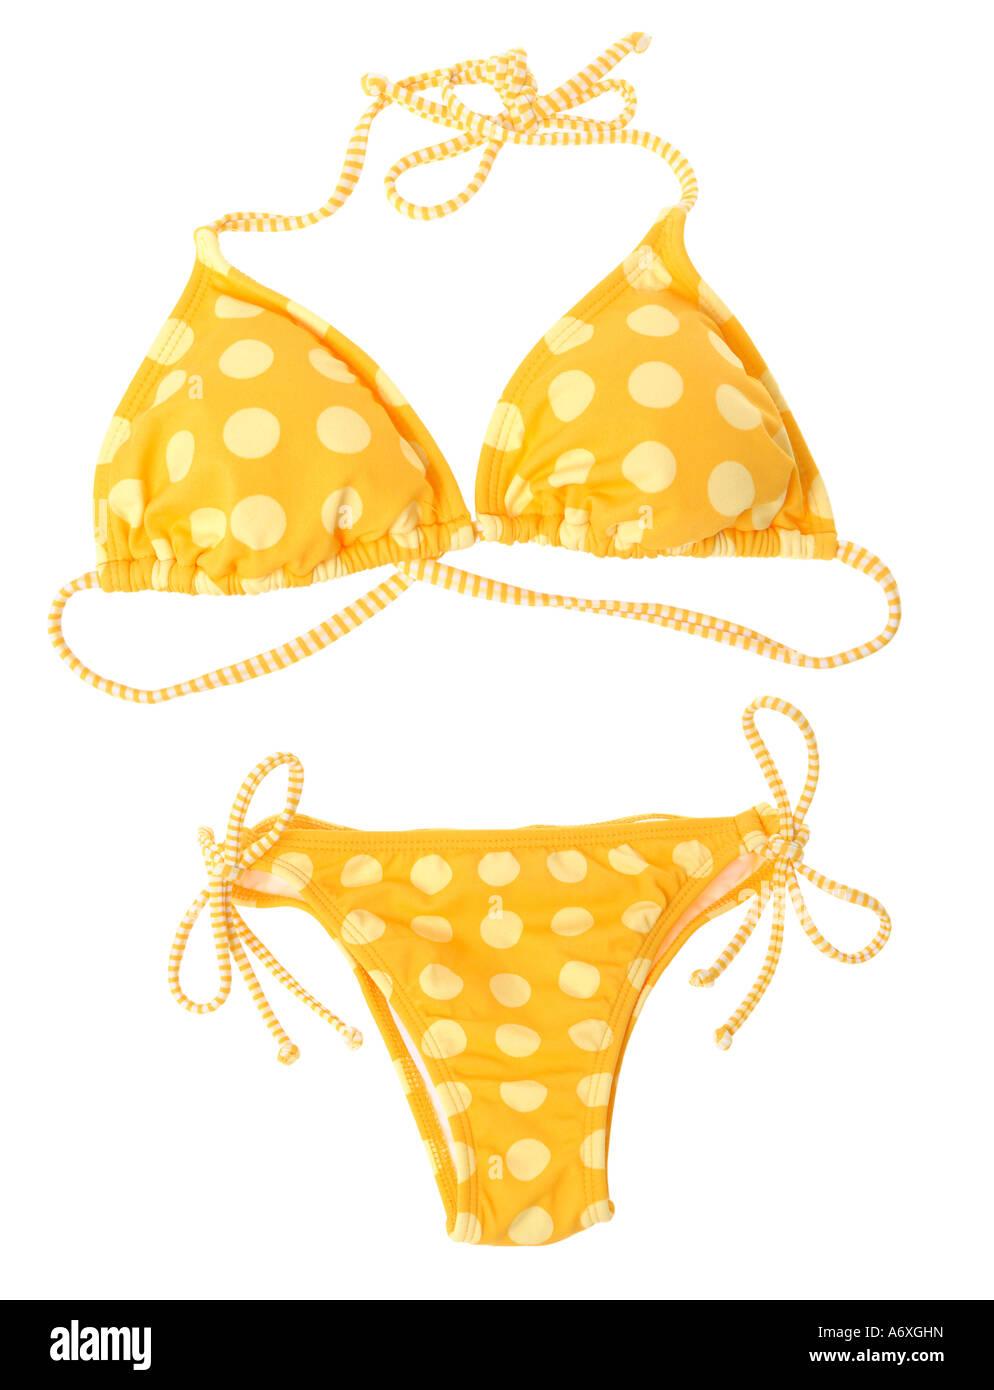 Bikini jaune découper sur fond blanc Photo Stock